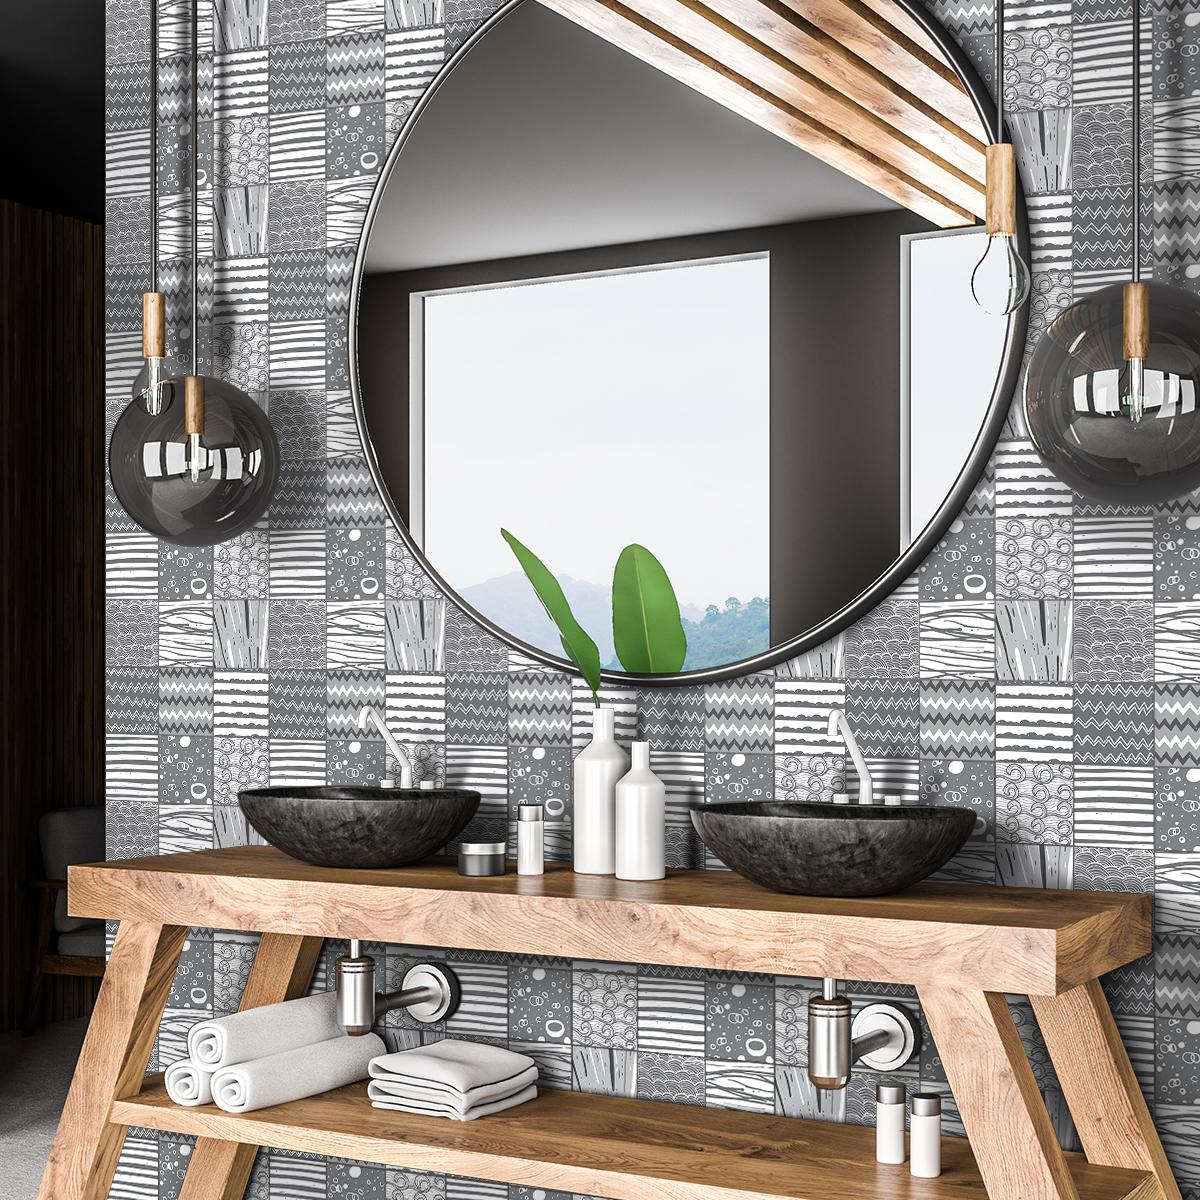 60 stickers carreaux de ciment azulejos calixto cuisine. Black Bedroom Furniture Sets. Home Design Ideas